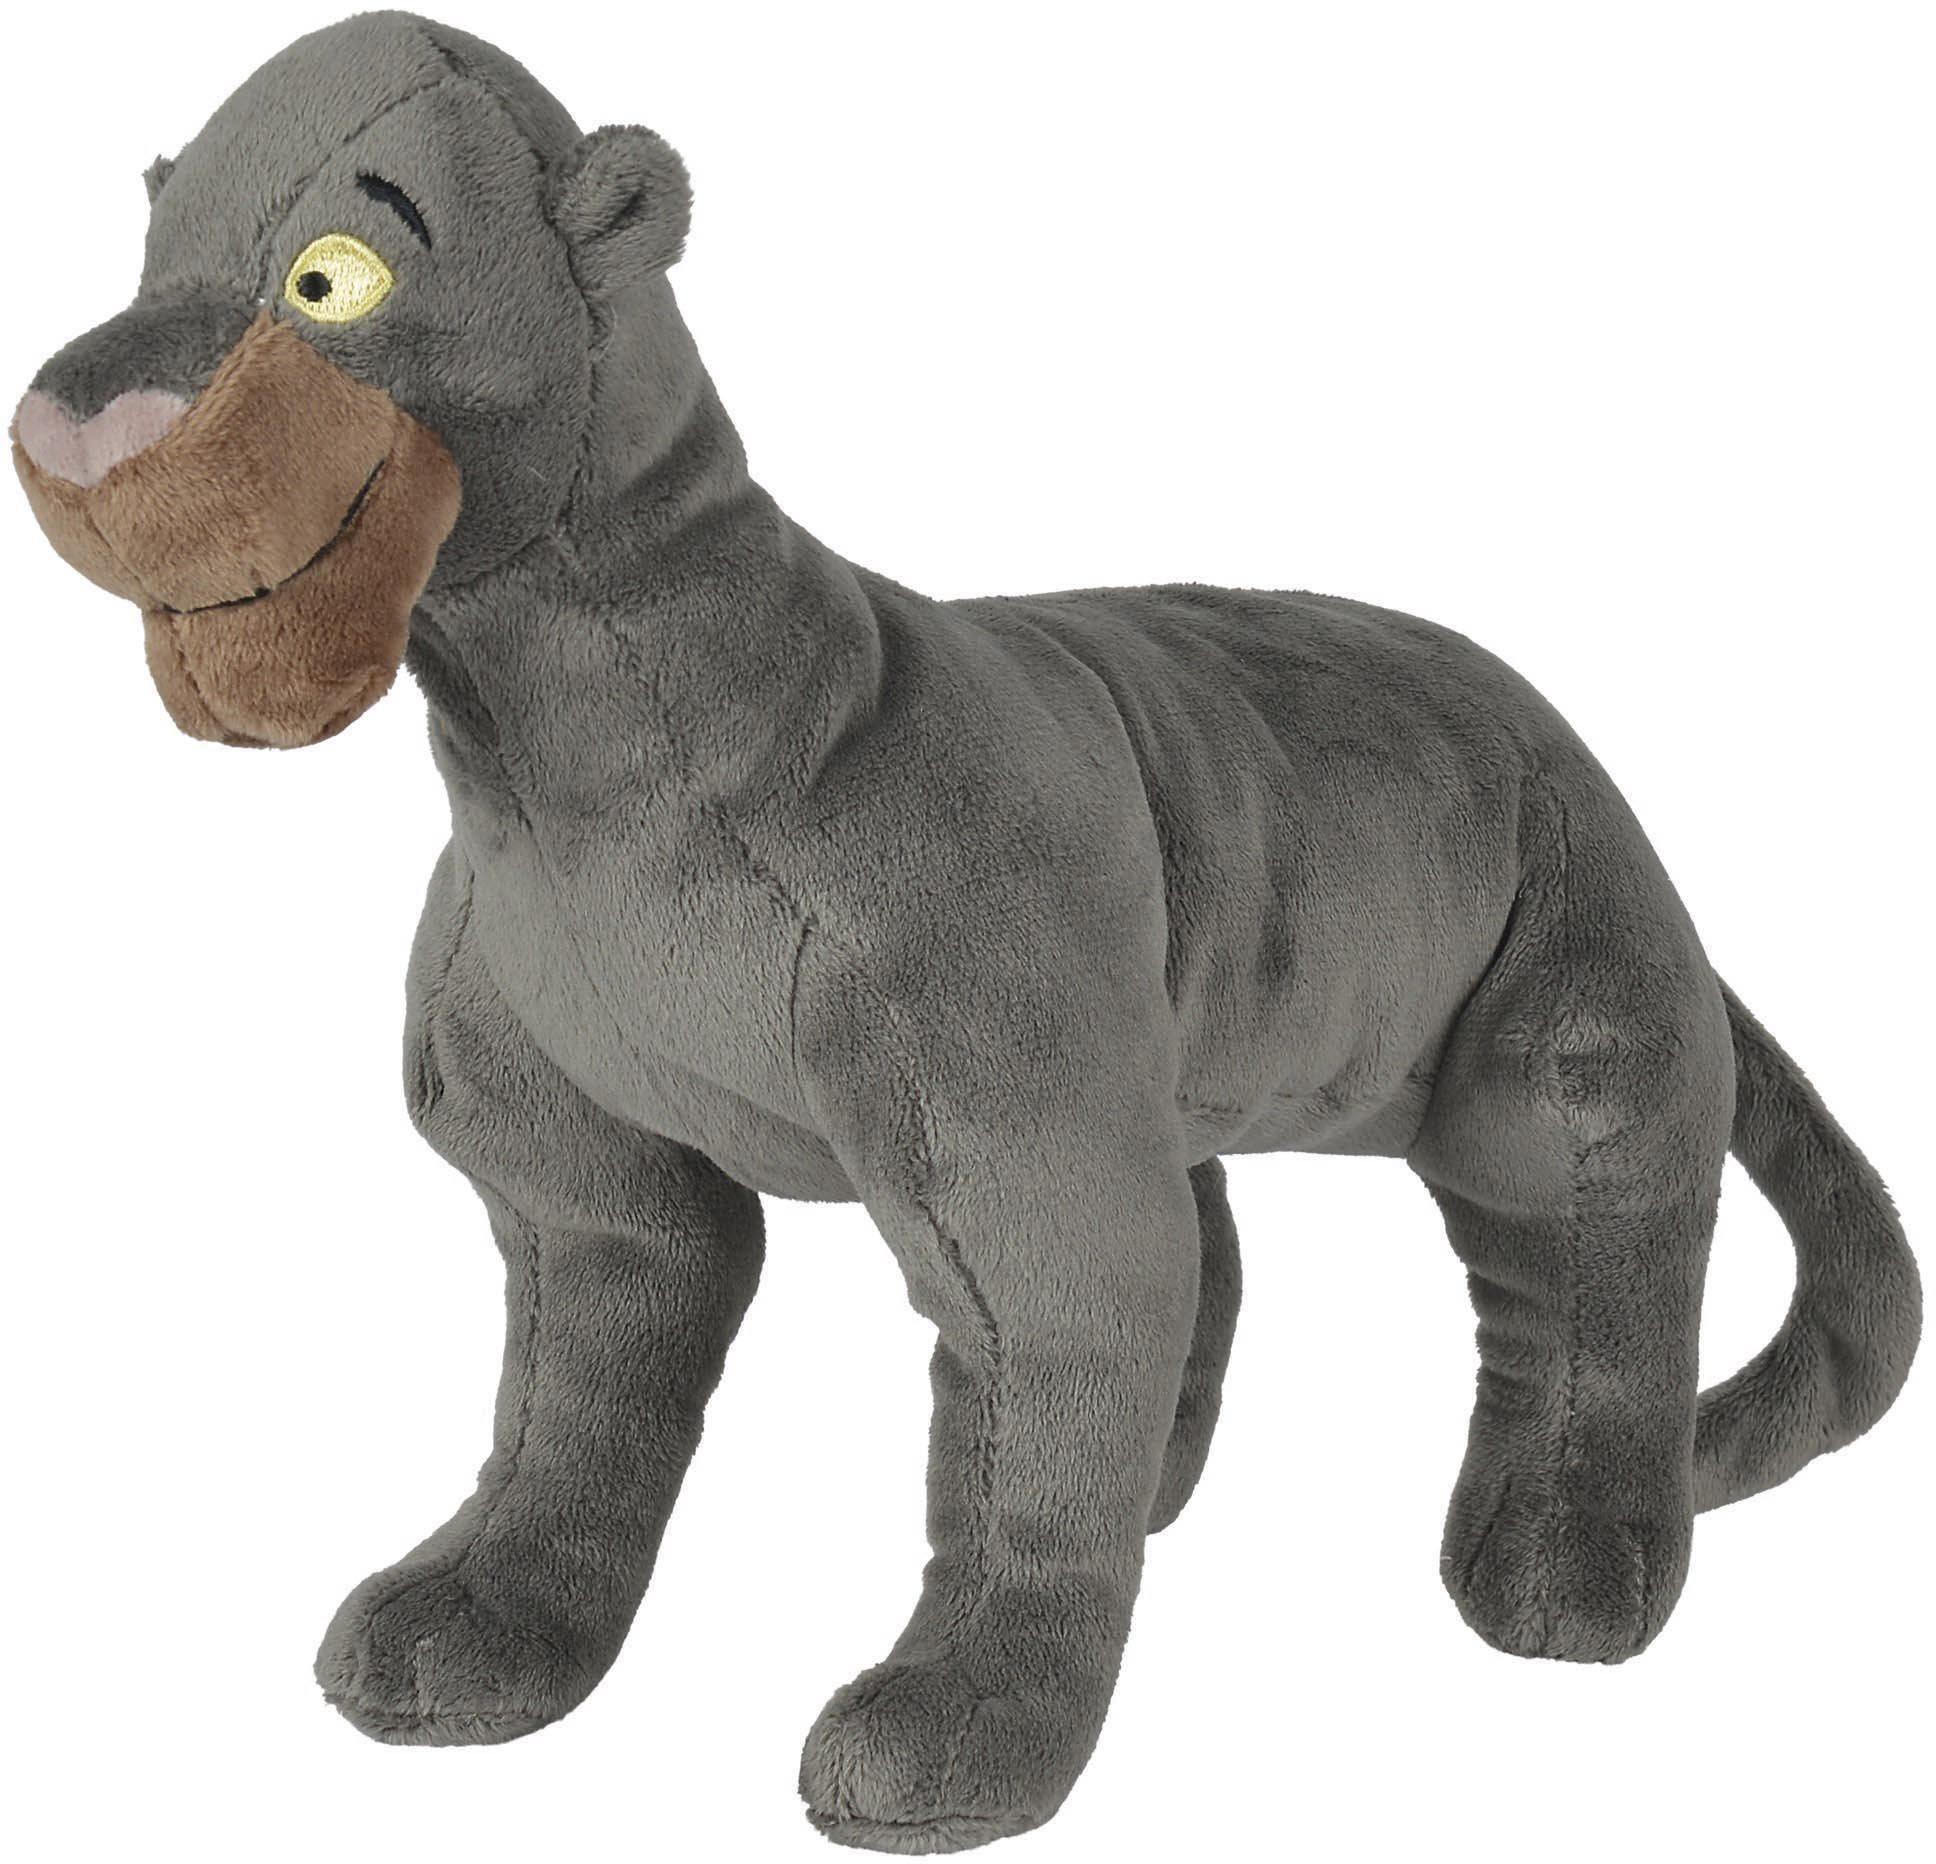 Мягкая игрушка  Багира, 25 см. - Мягкие игрушки Disney, артикул: 152211